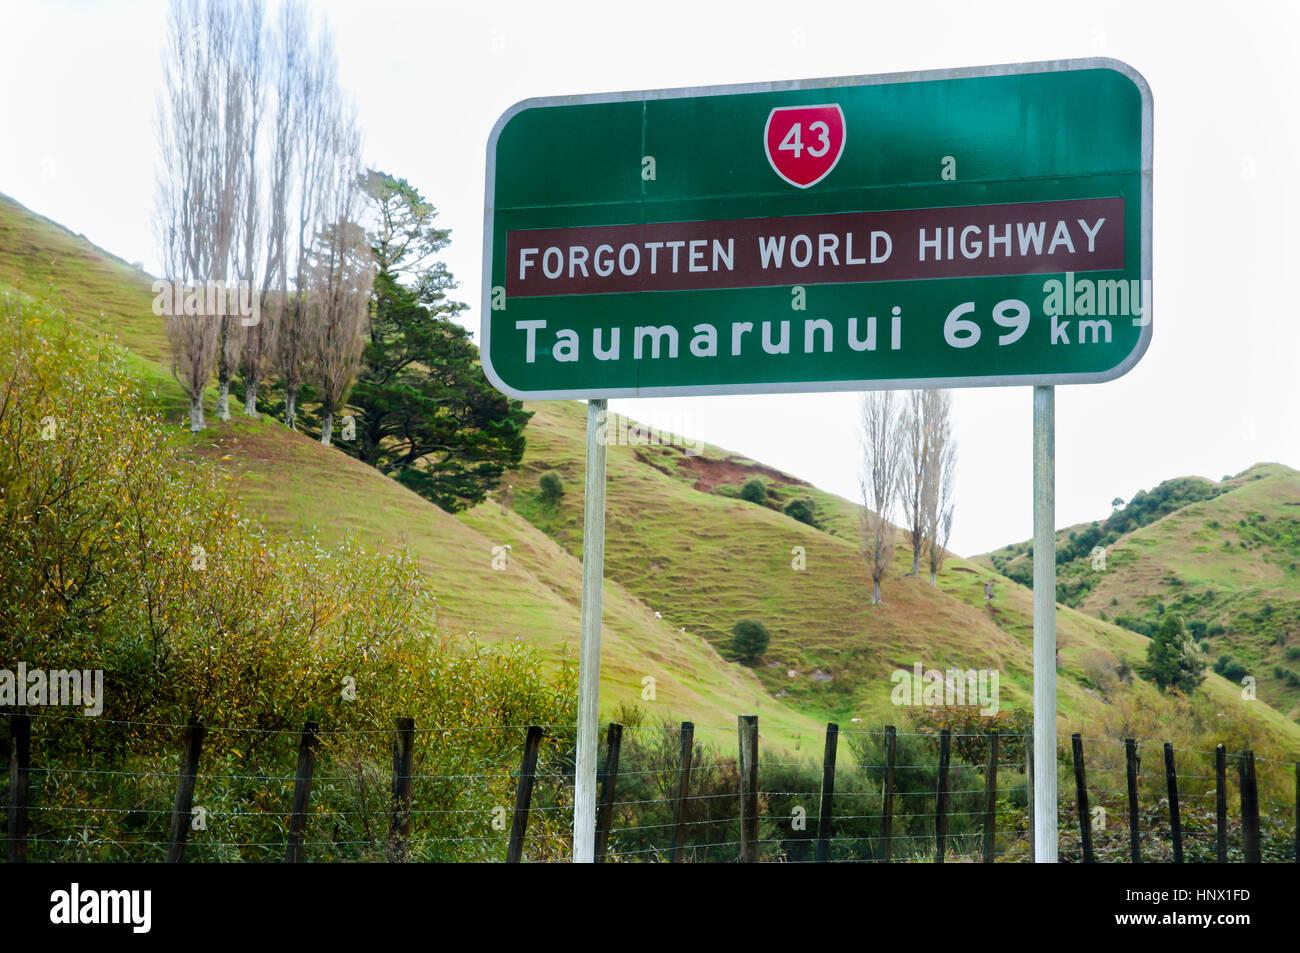 Forgotten World Highway Sign - New Zealand - Stock Image